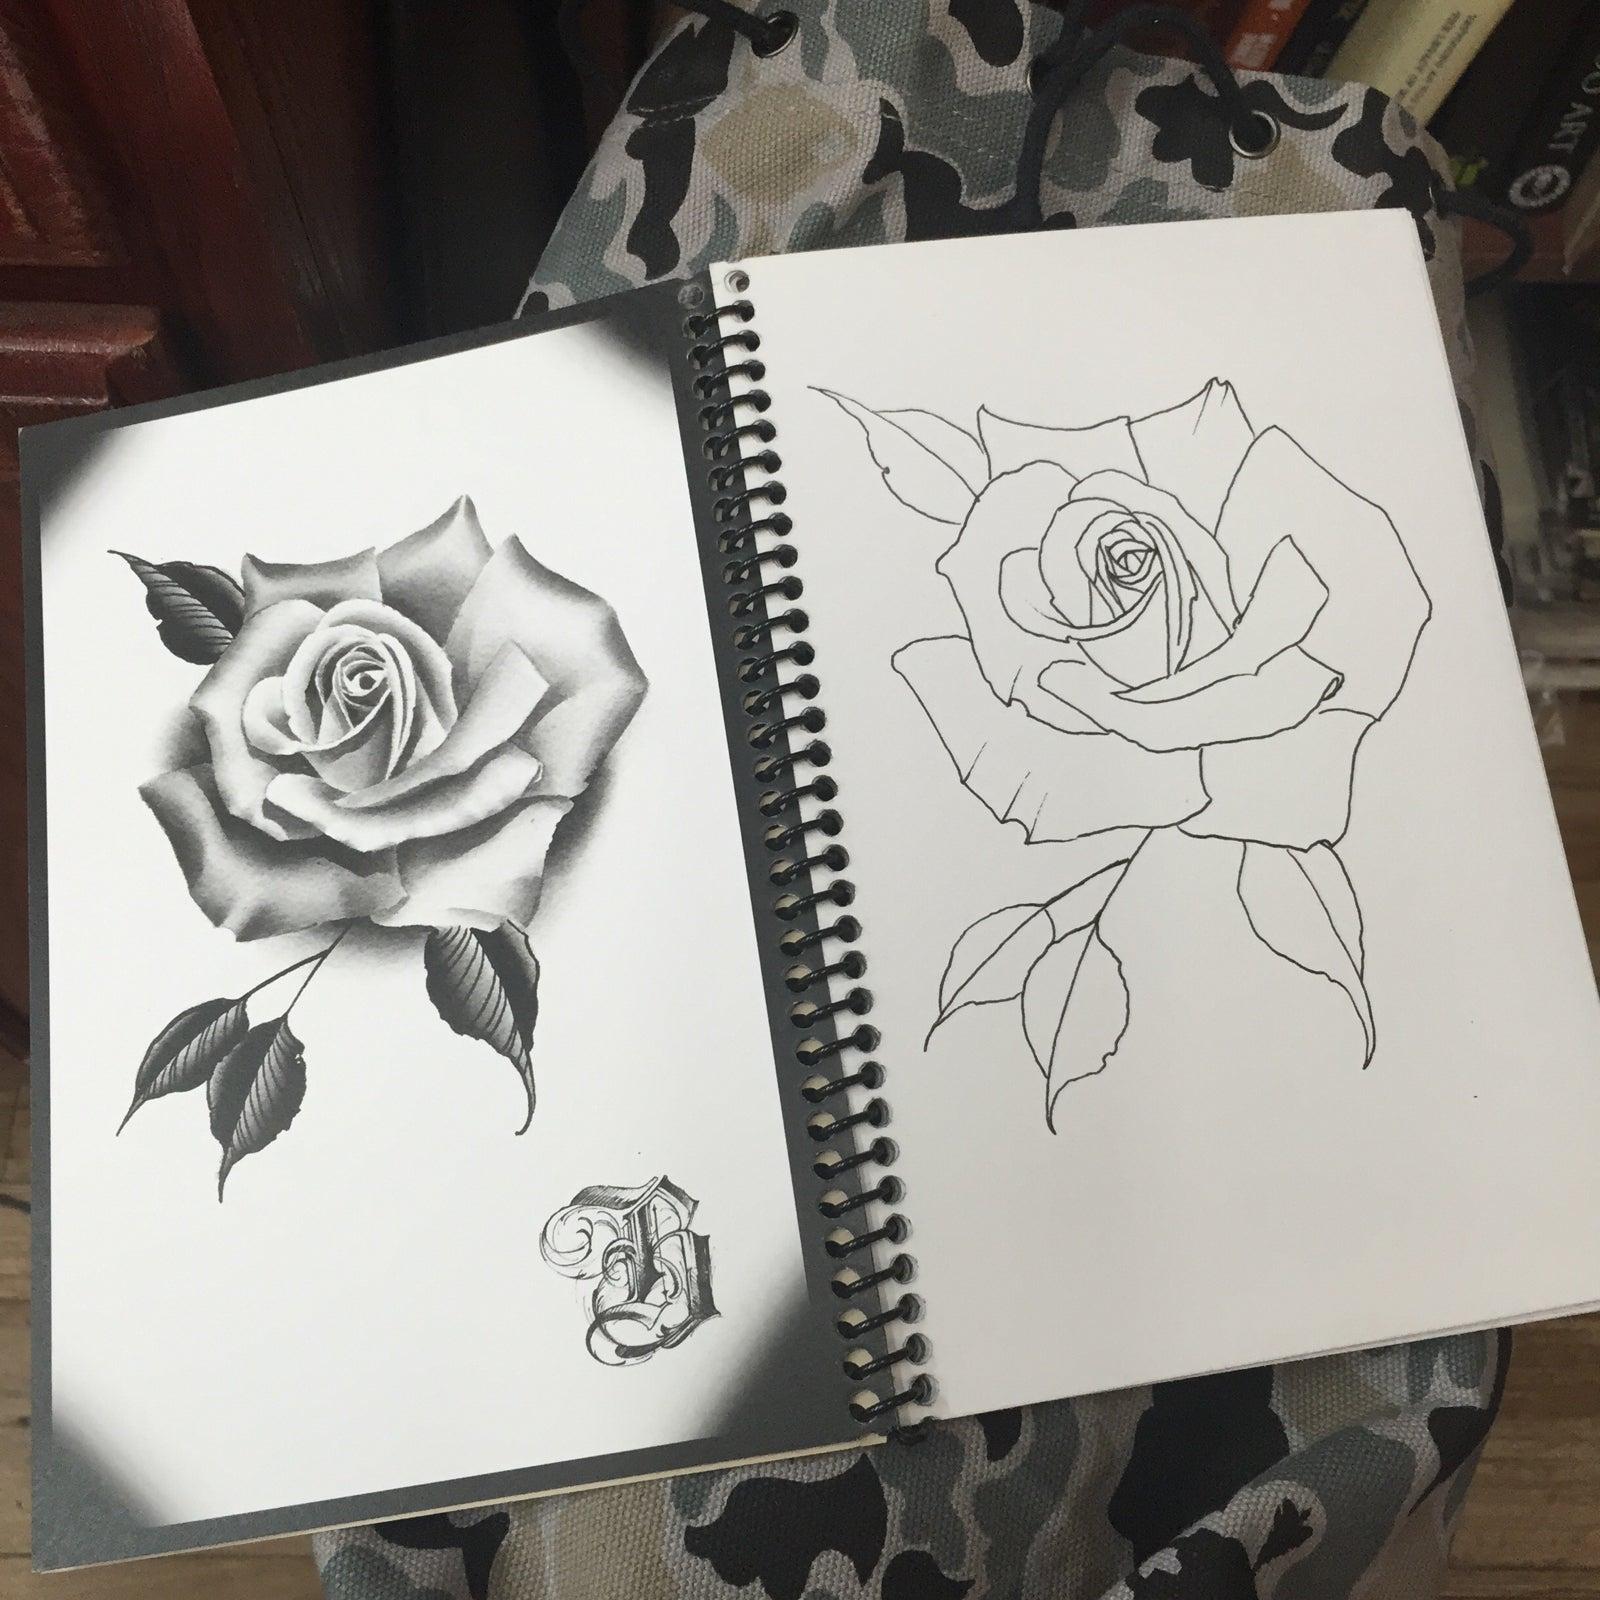 Book of Roses / BJ Betts